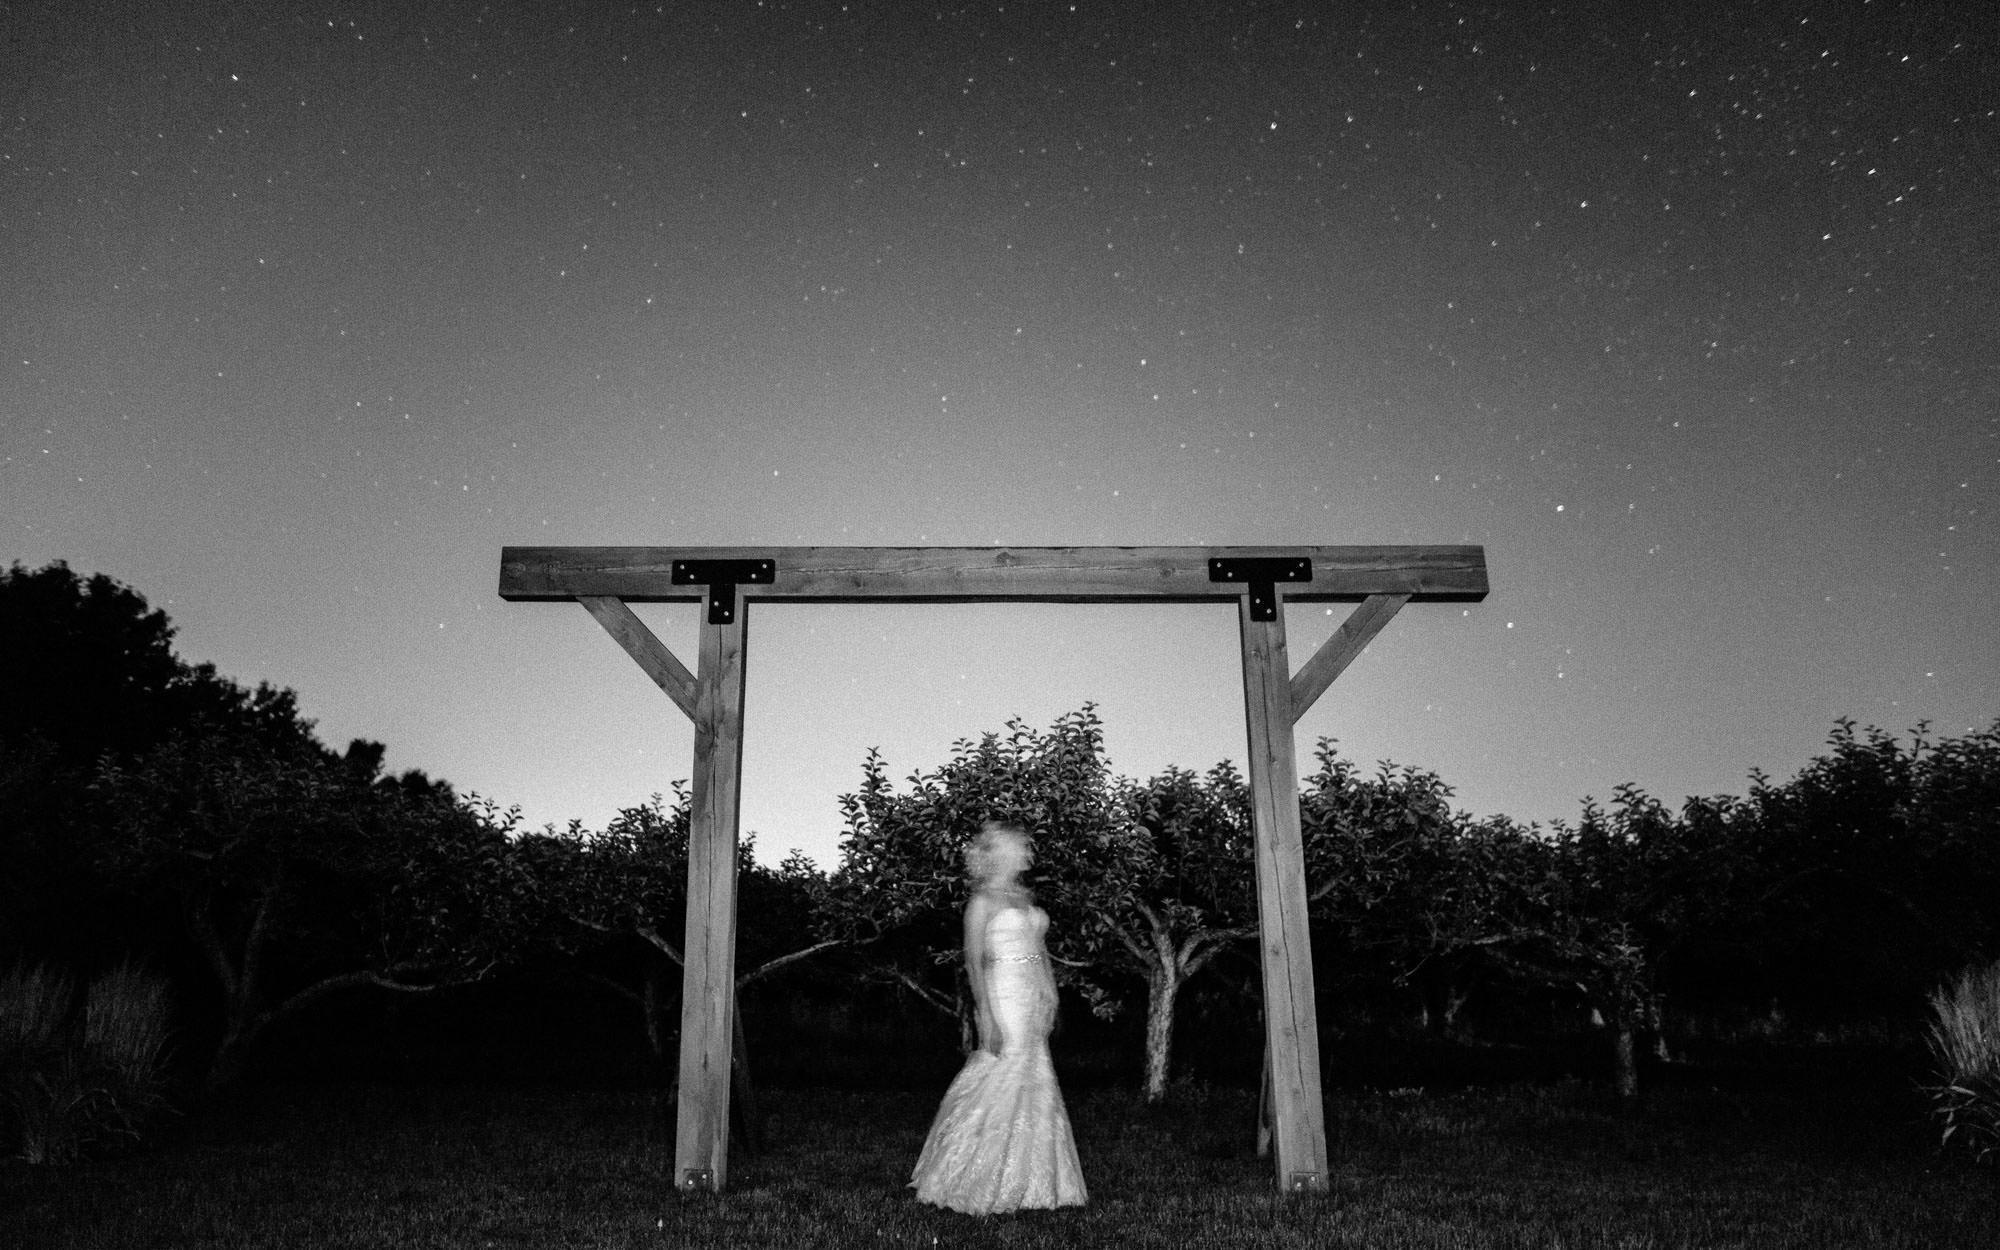 meadow-barn-wedding-sioux-falls-south-dakota-romantic-adventerous-michael-liedtke-photography136.jpg